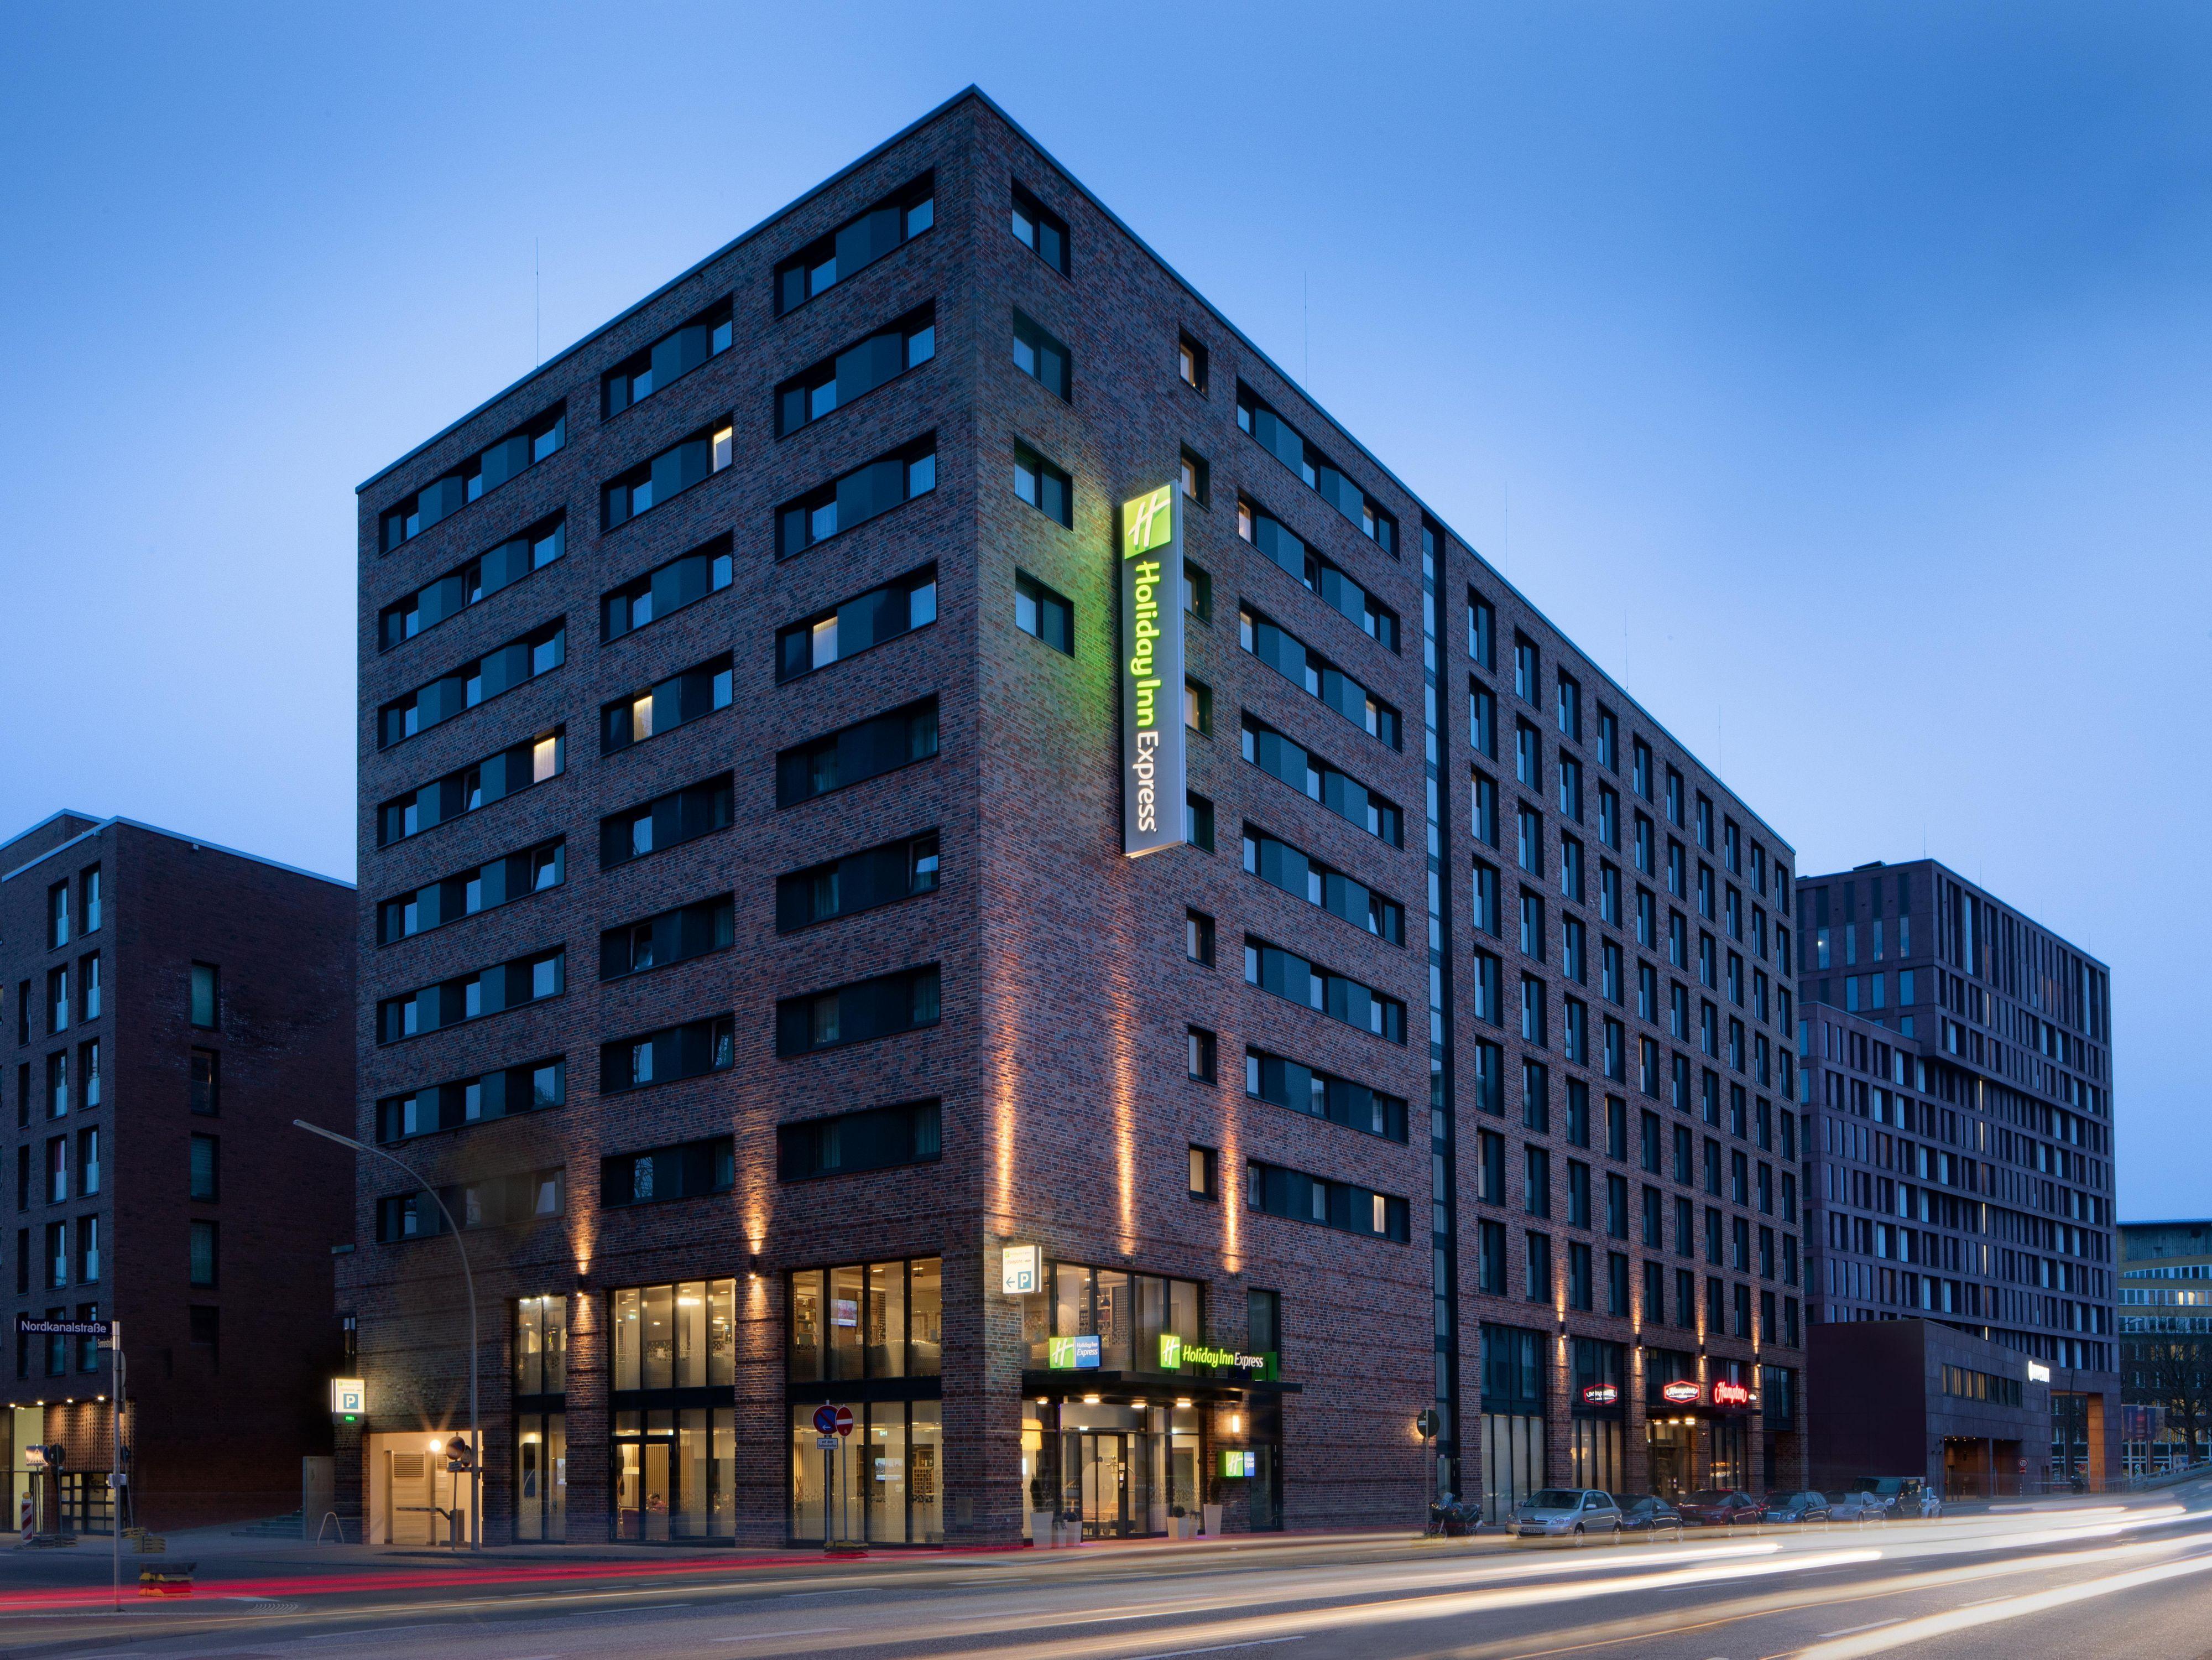 Holiday Inn Express Hotel Hamburg City Hauptbahnhof